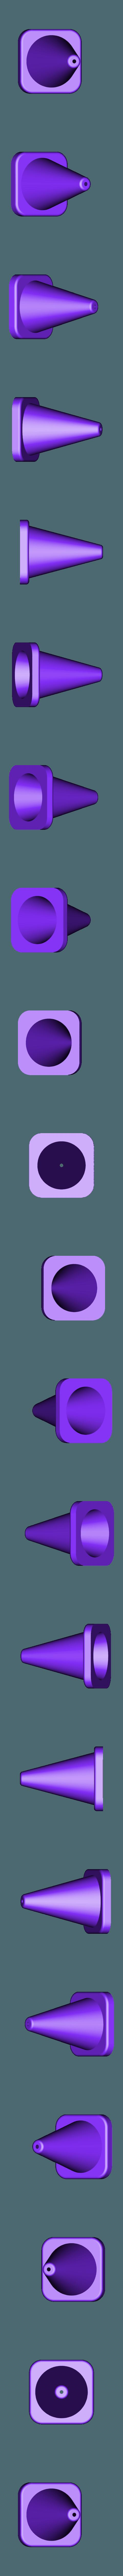 Tiny Traffic Cone.stl Download free STL file Tiny Traffic Cone • 3D printer object, FerryTeacher